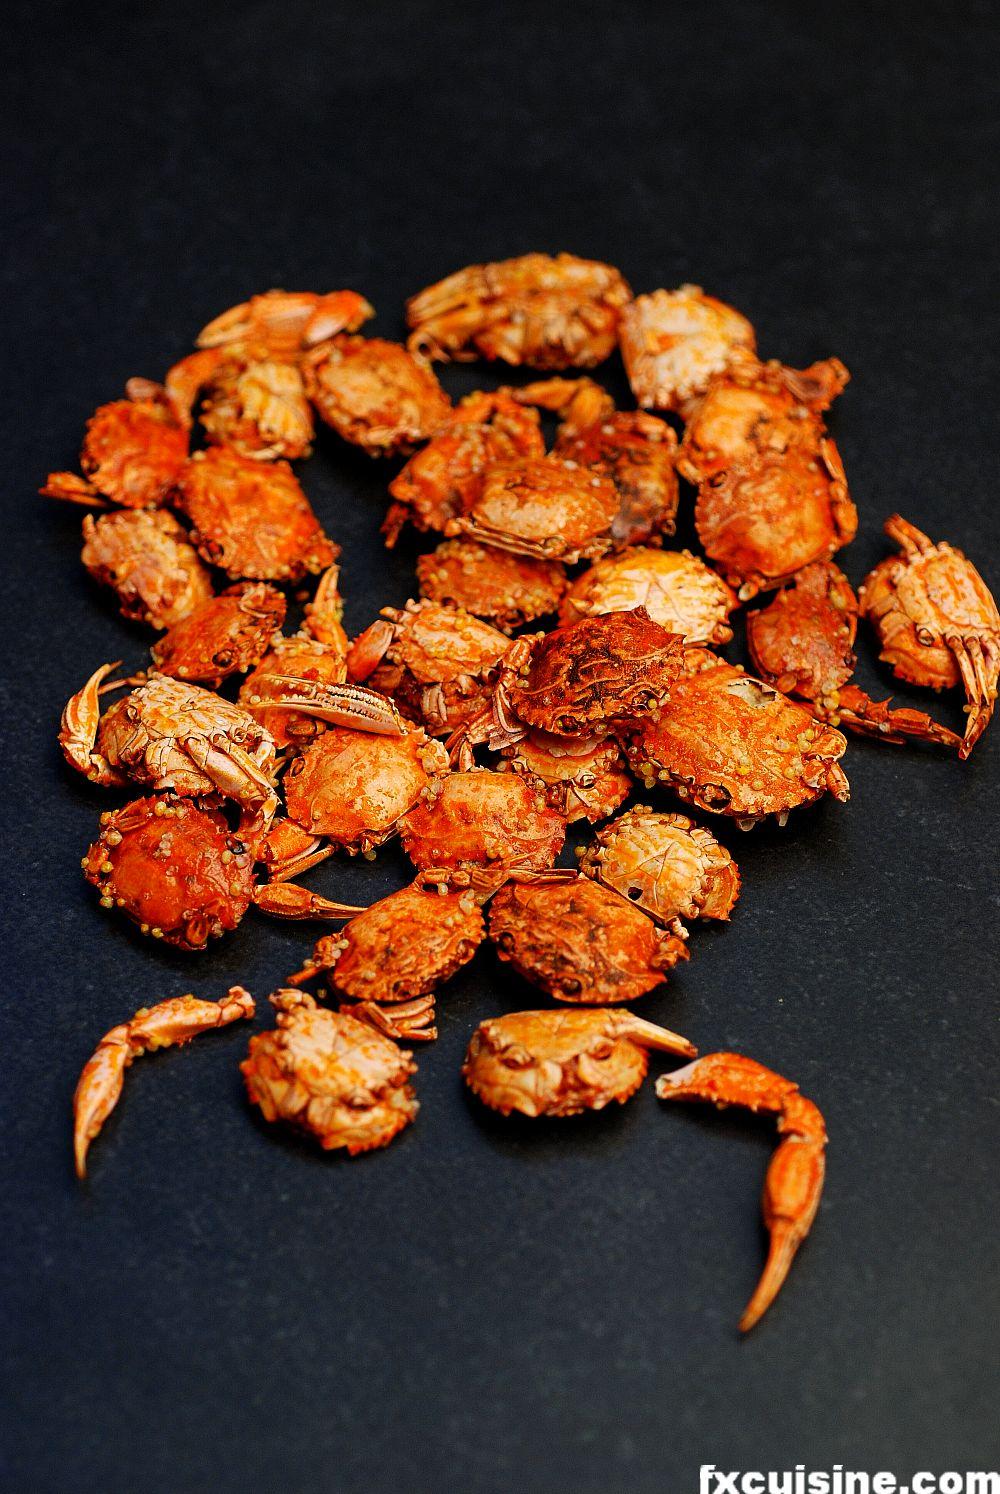 May I Eat Your Shrimp Shells